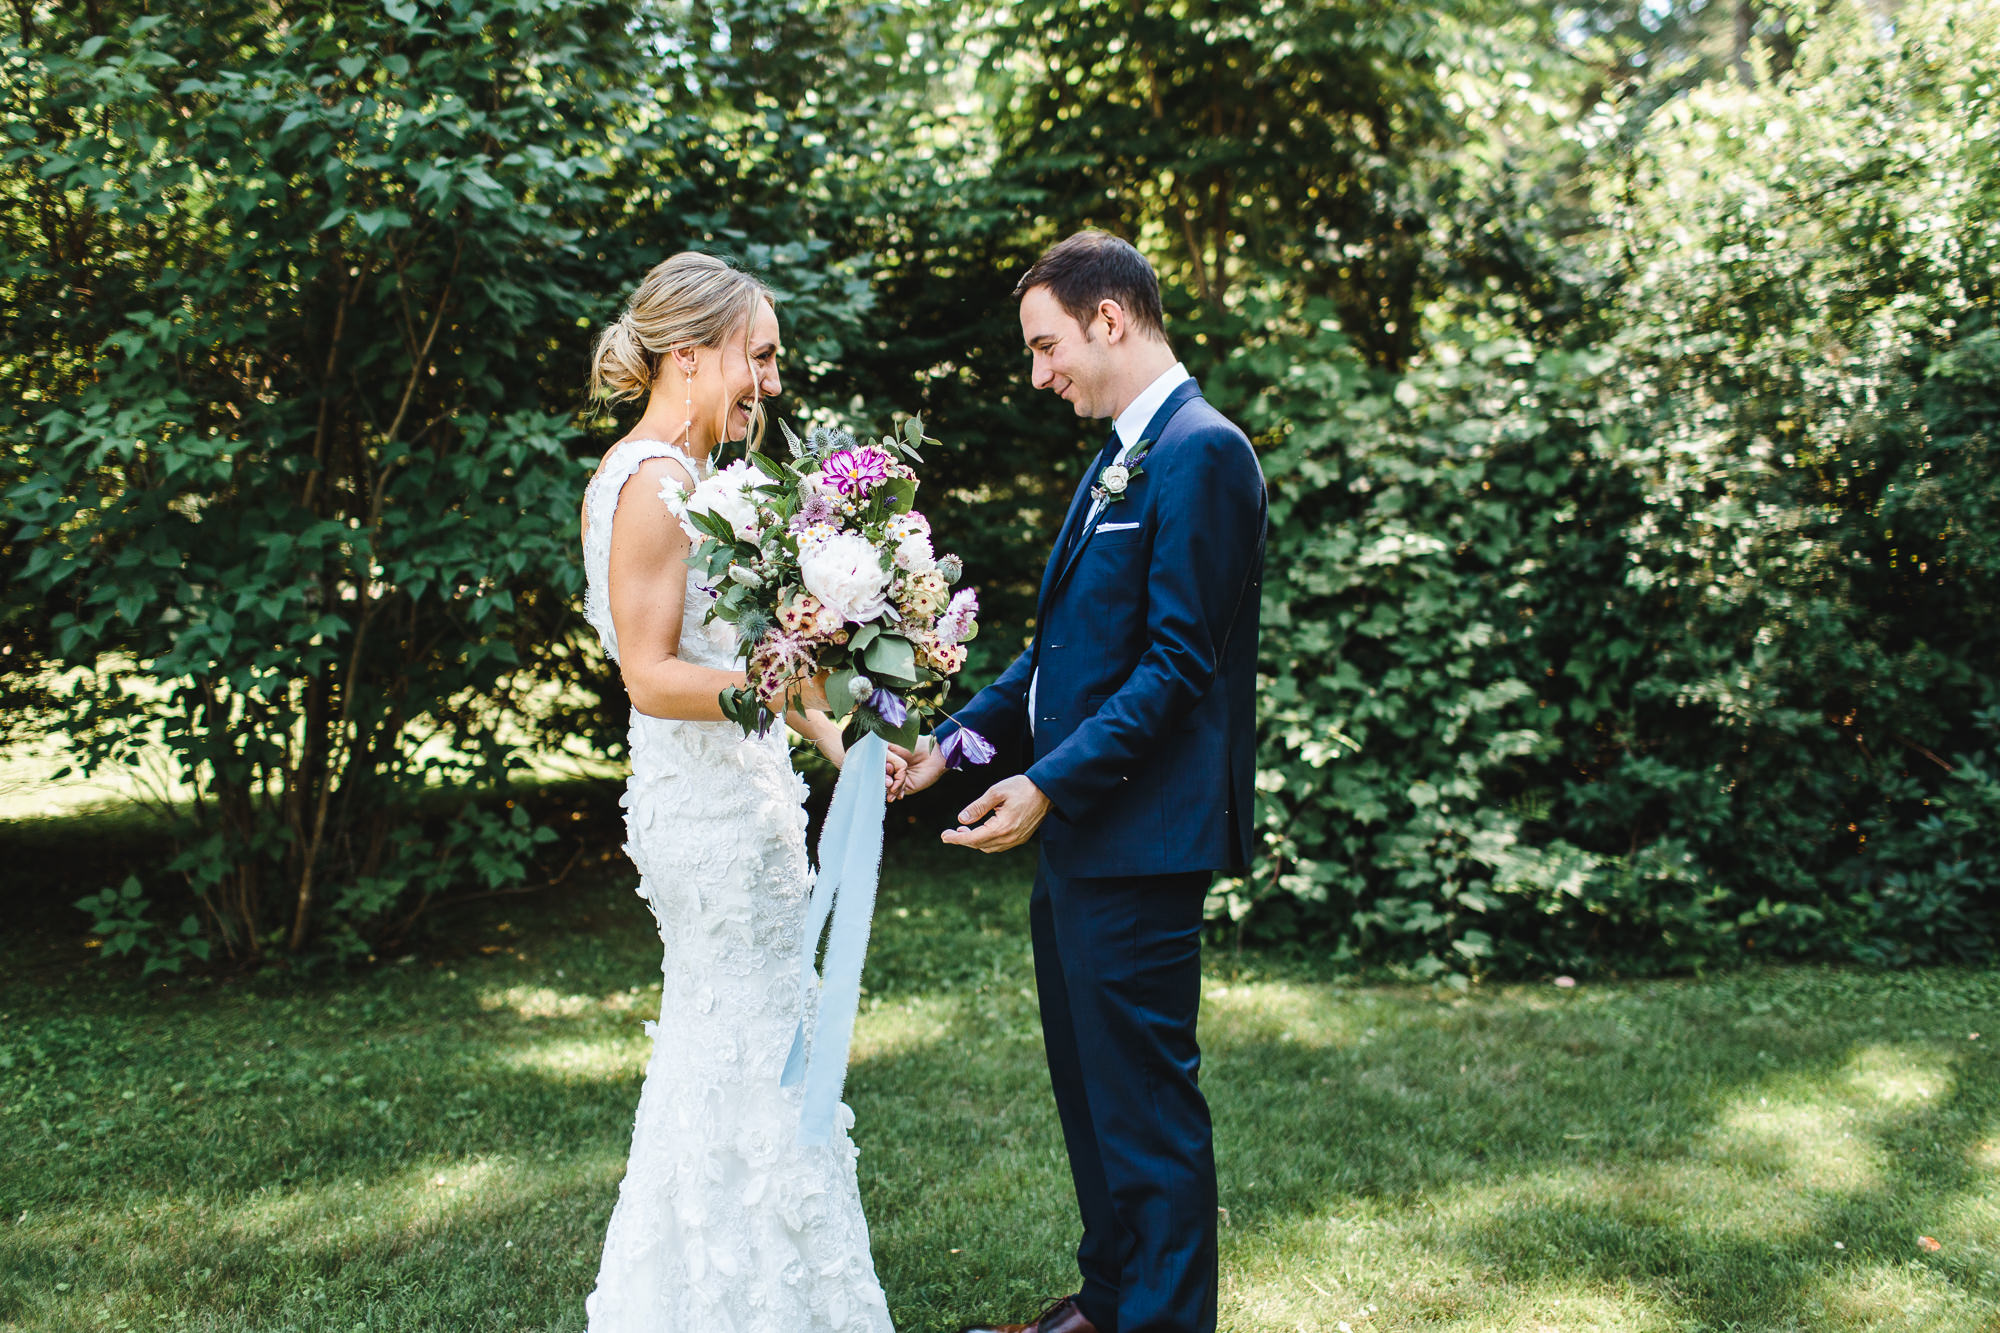 connecticut-summer-lake-wedding-emily-kirke-photography-upstyle (41 of 181).jpg